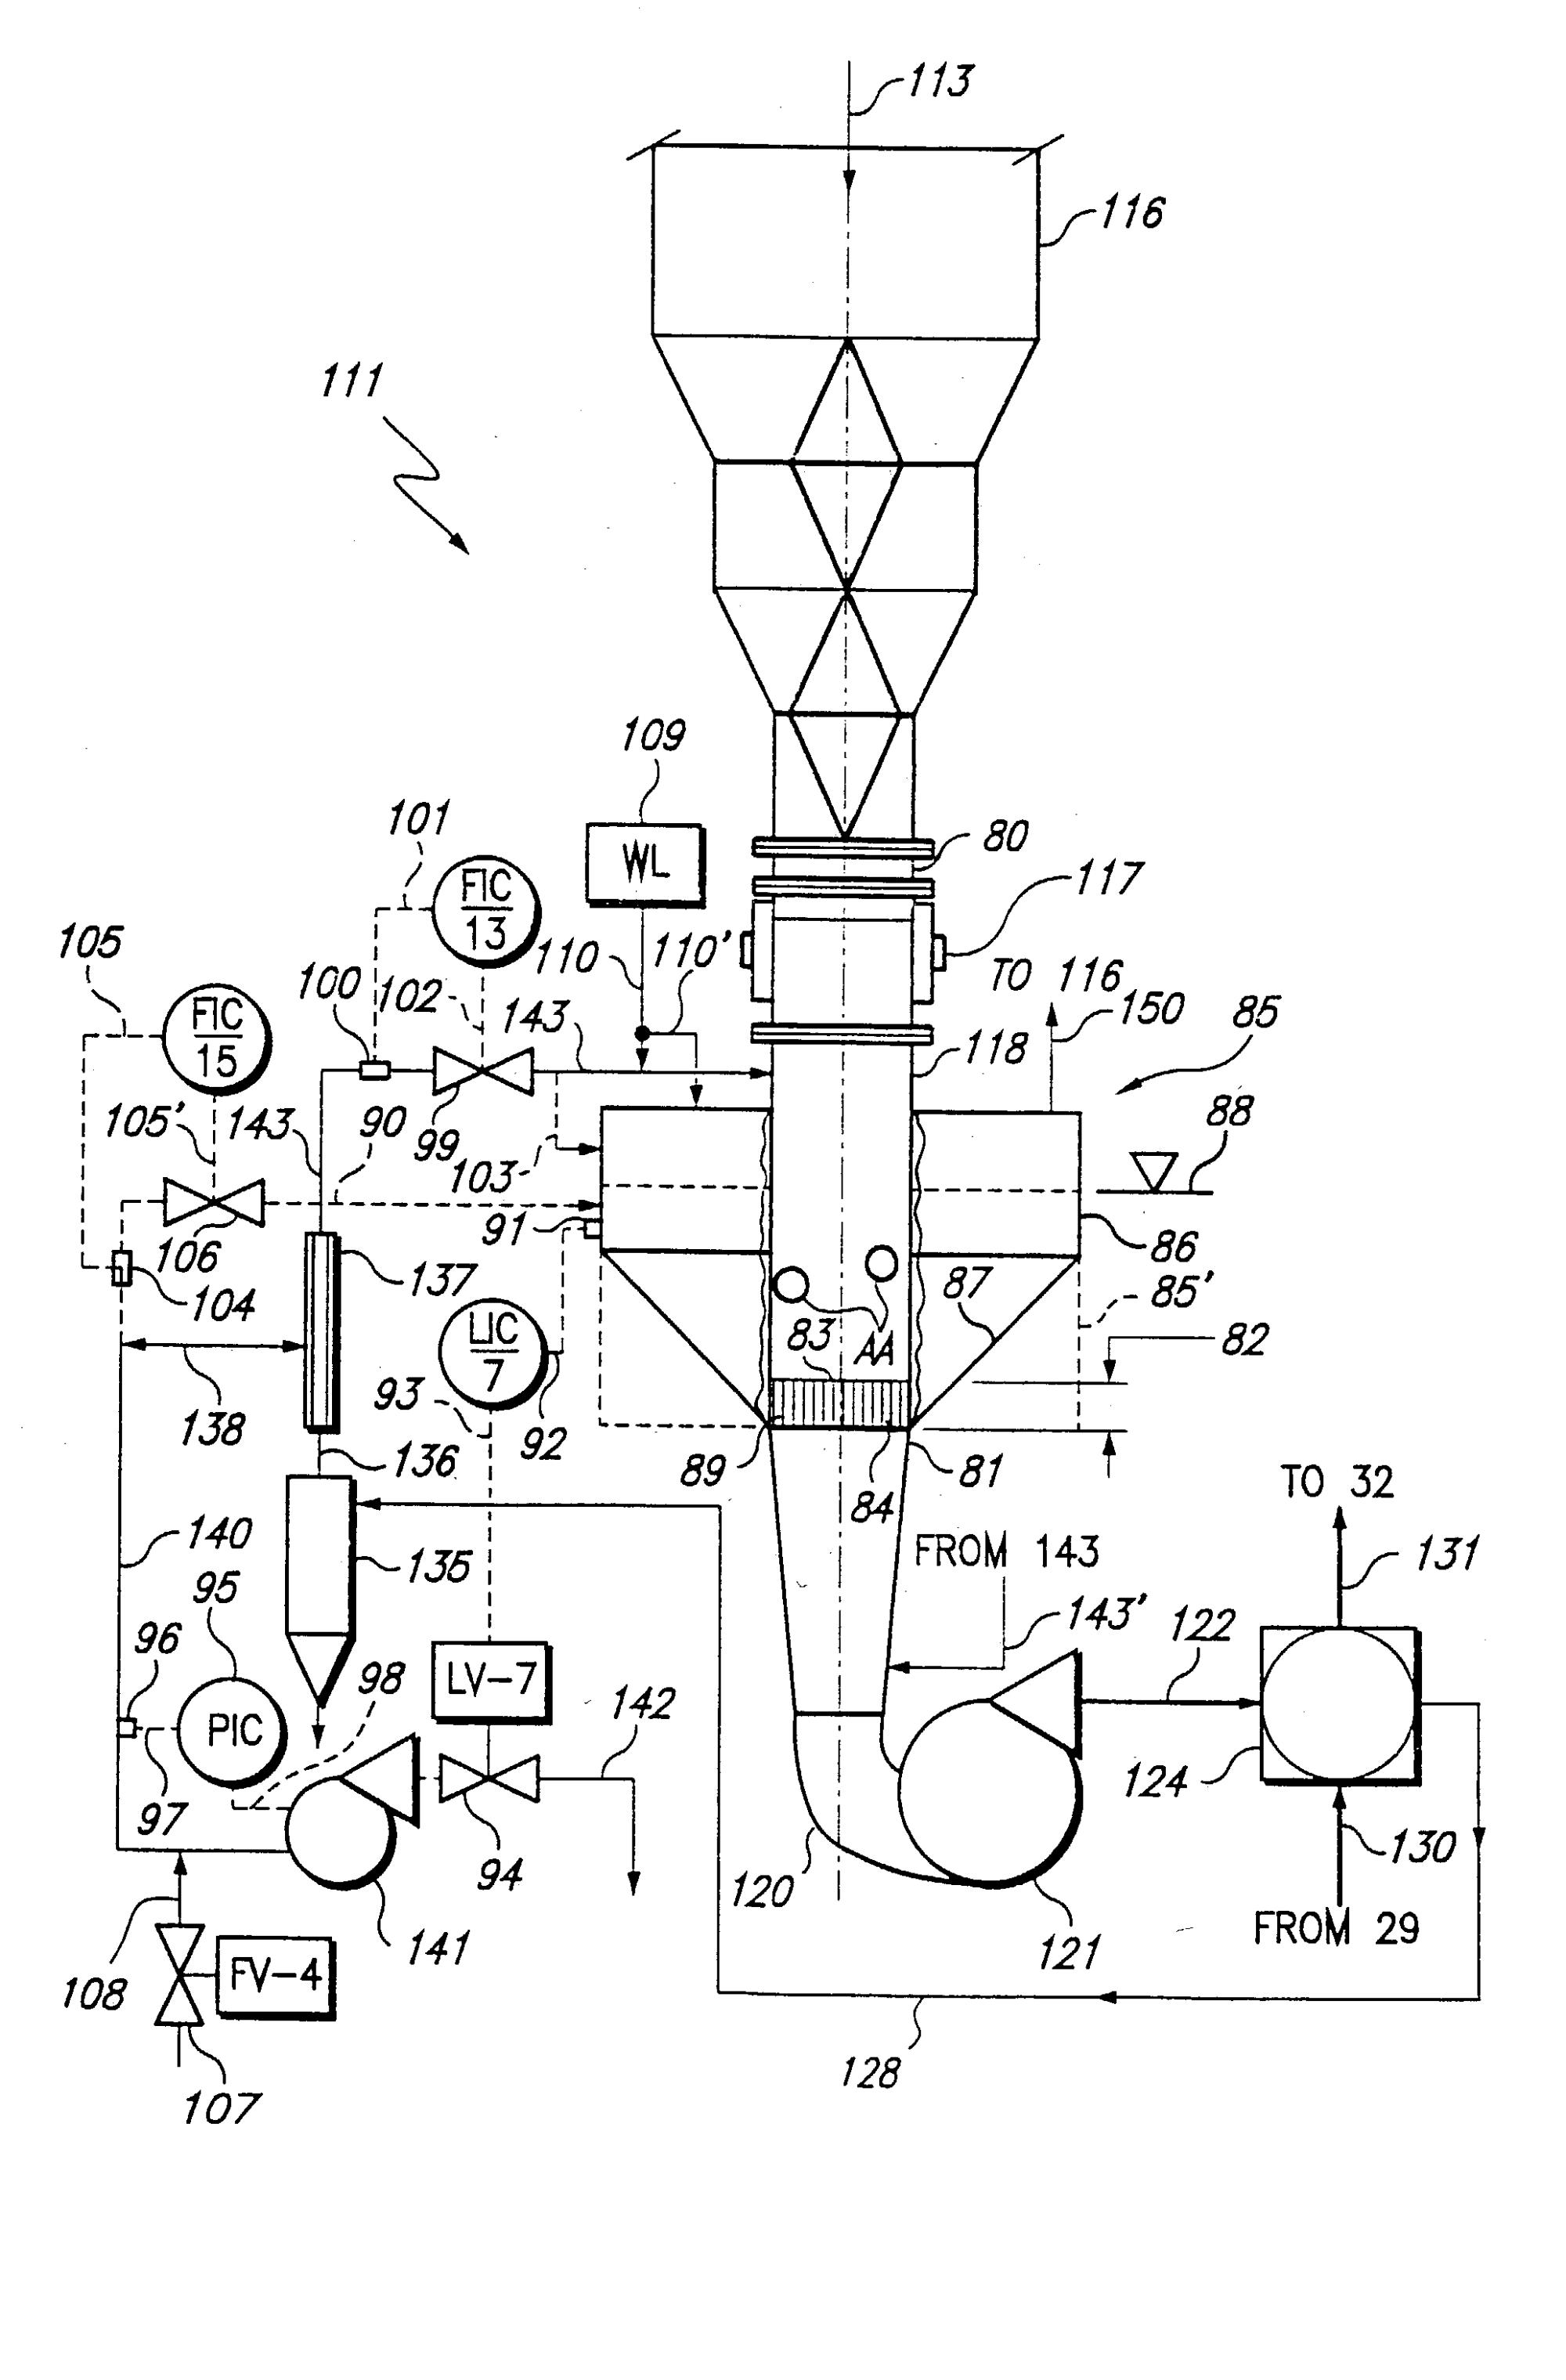 hight resolution of honda foreman 400 wiring diagram wiring source u2022 2004 honda foreman wiring diagram 1997